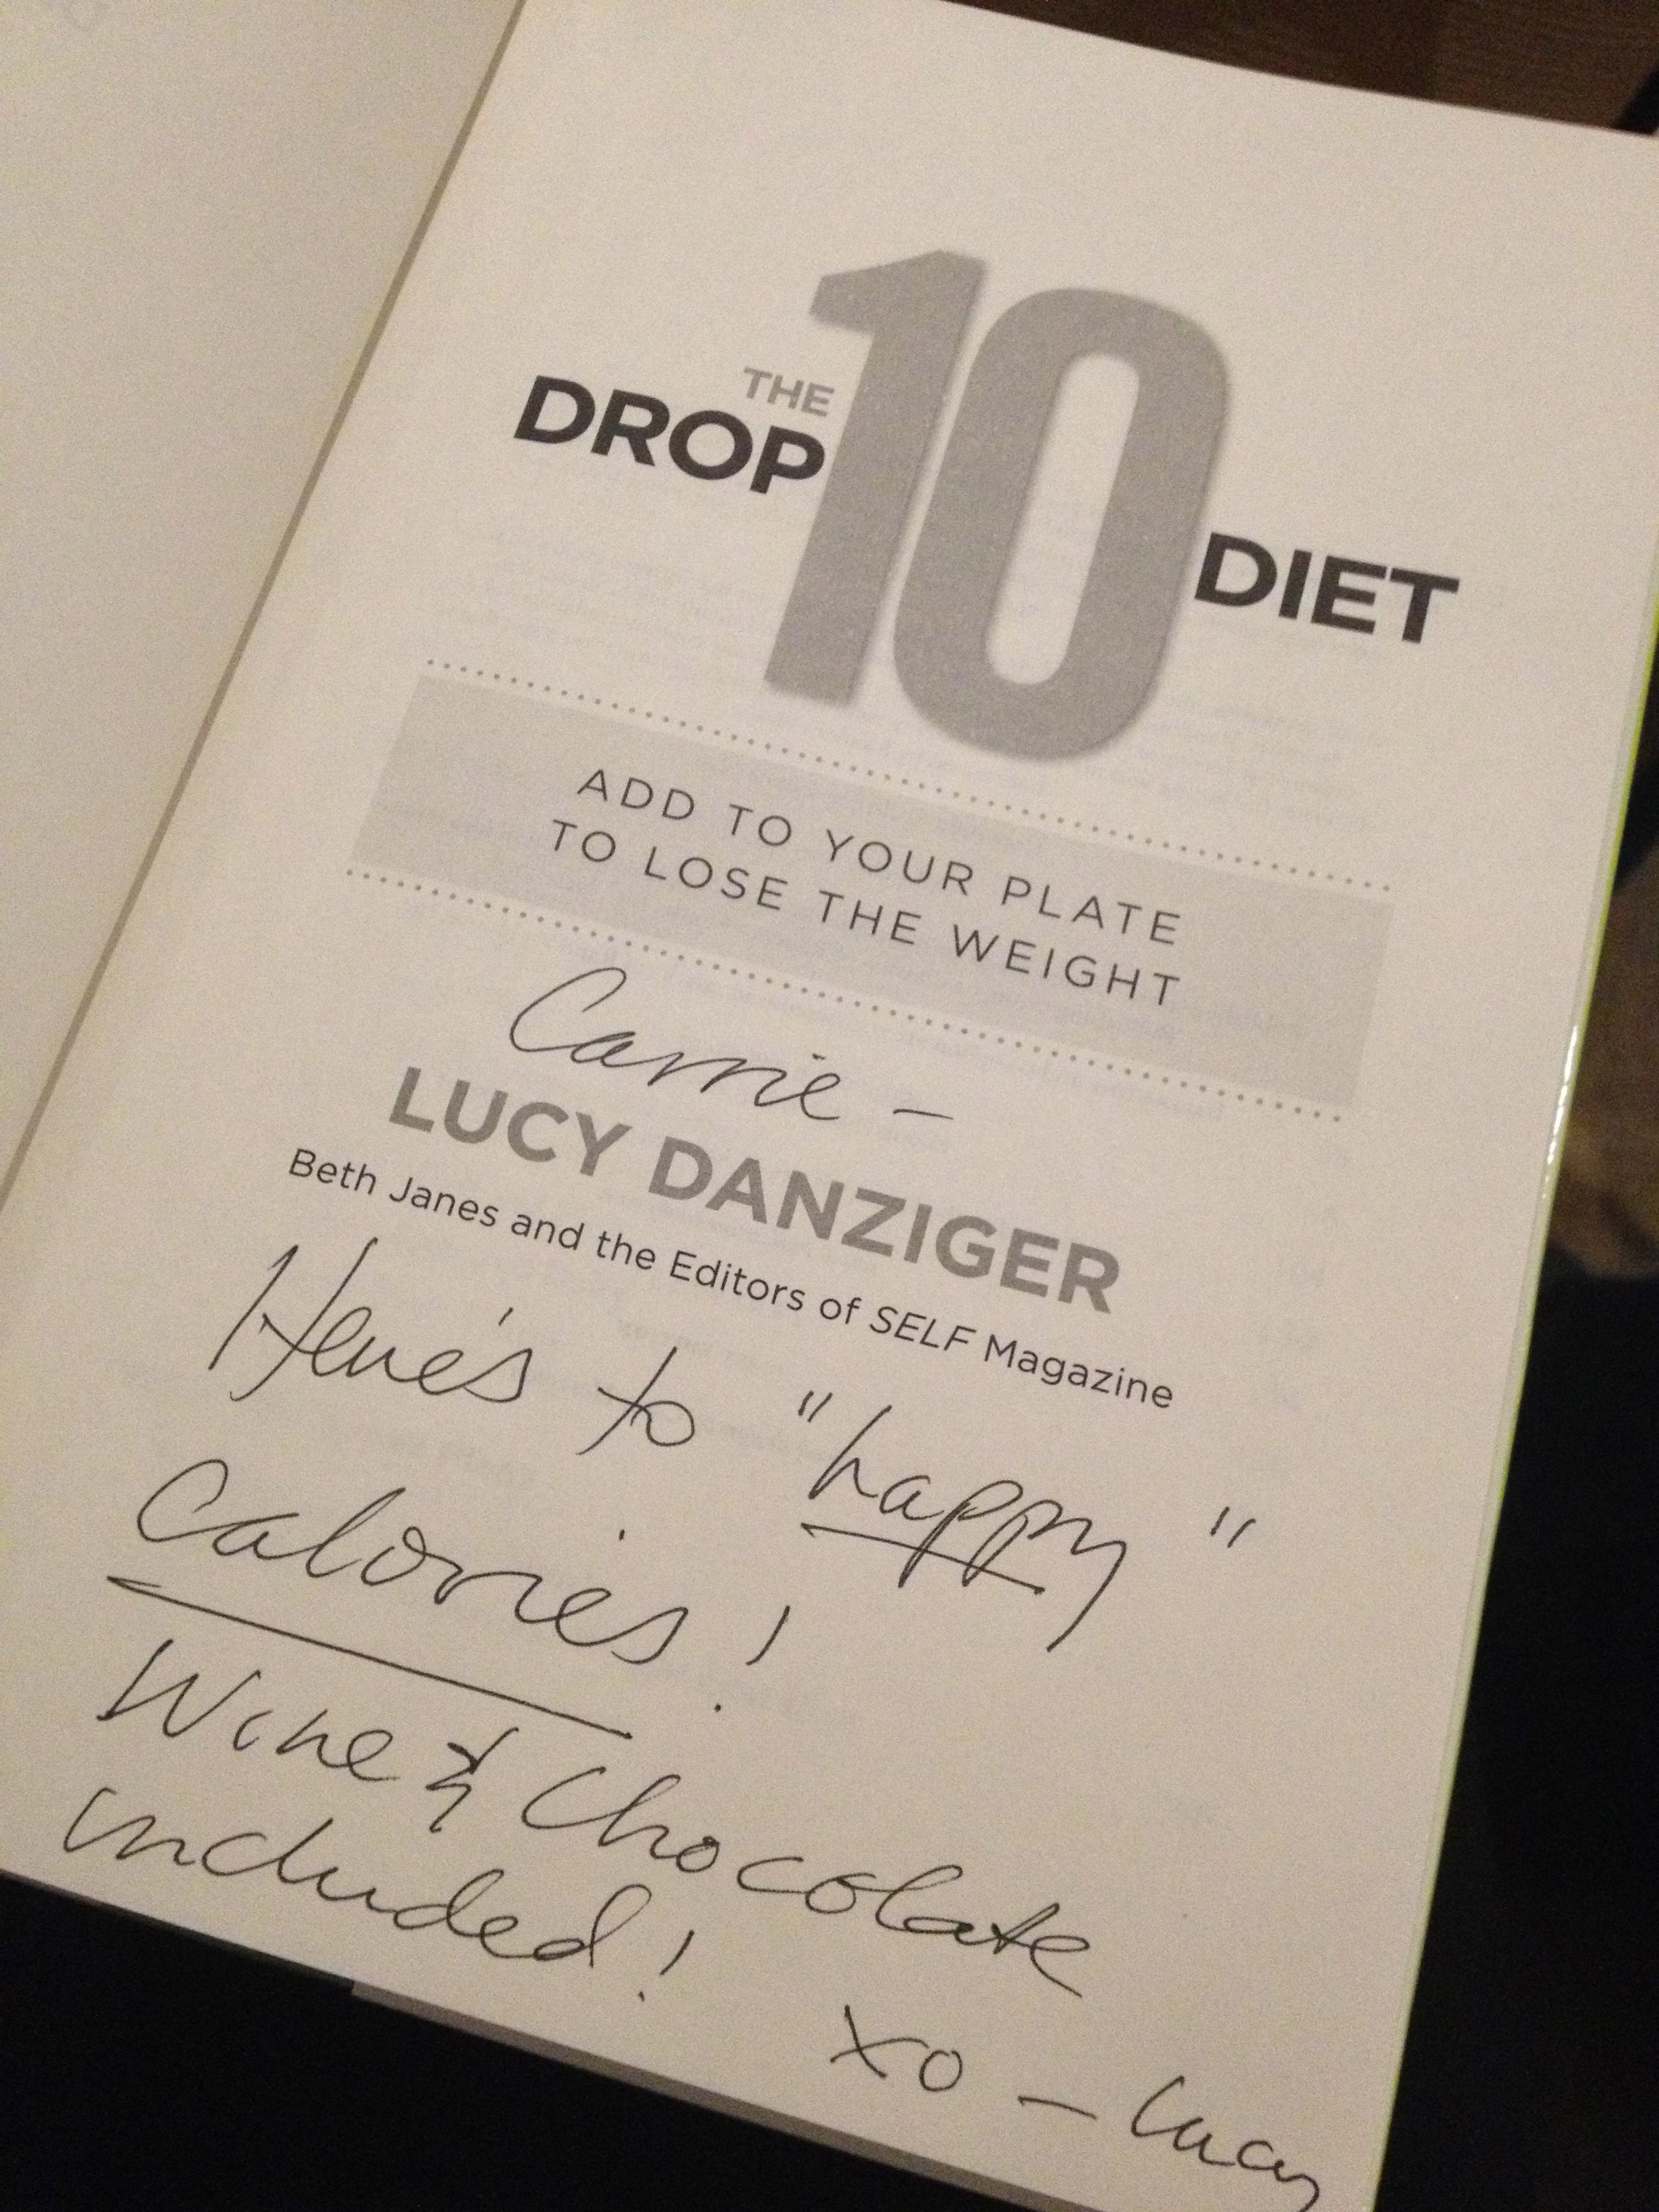 open-house-random-house-drop-10-diet2